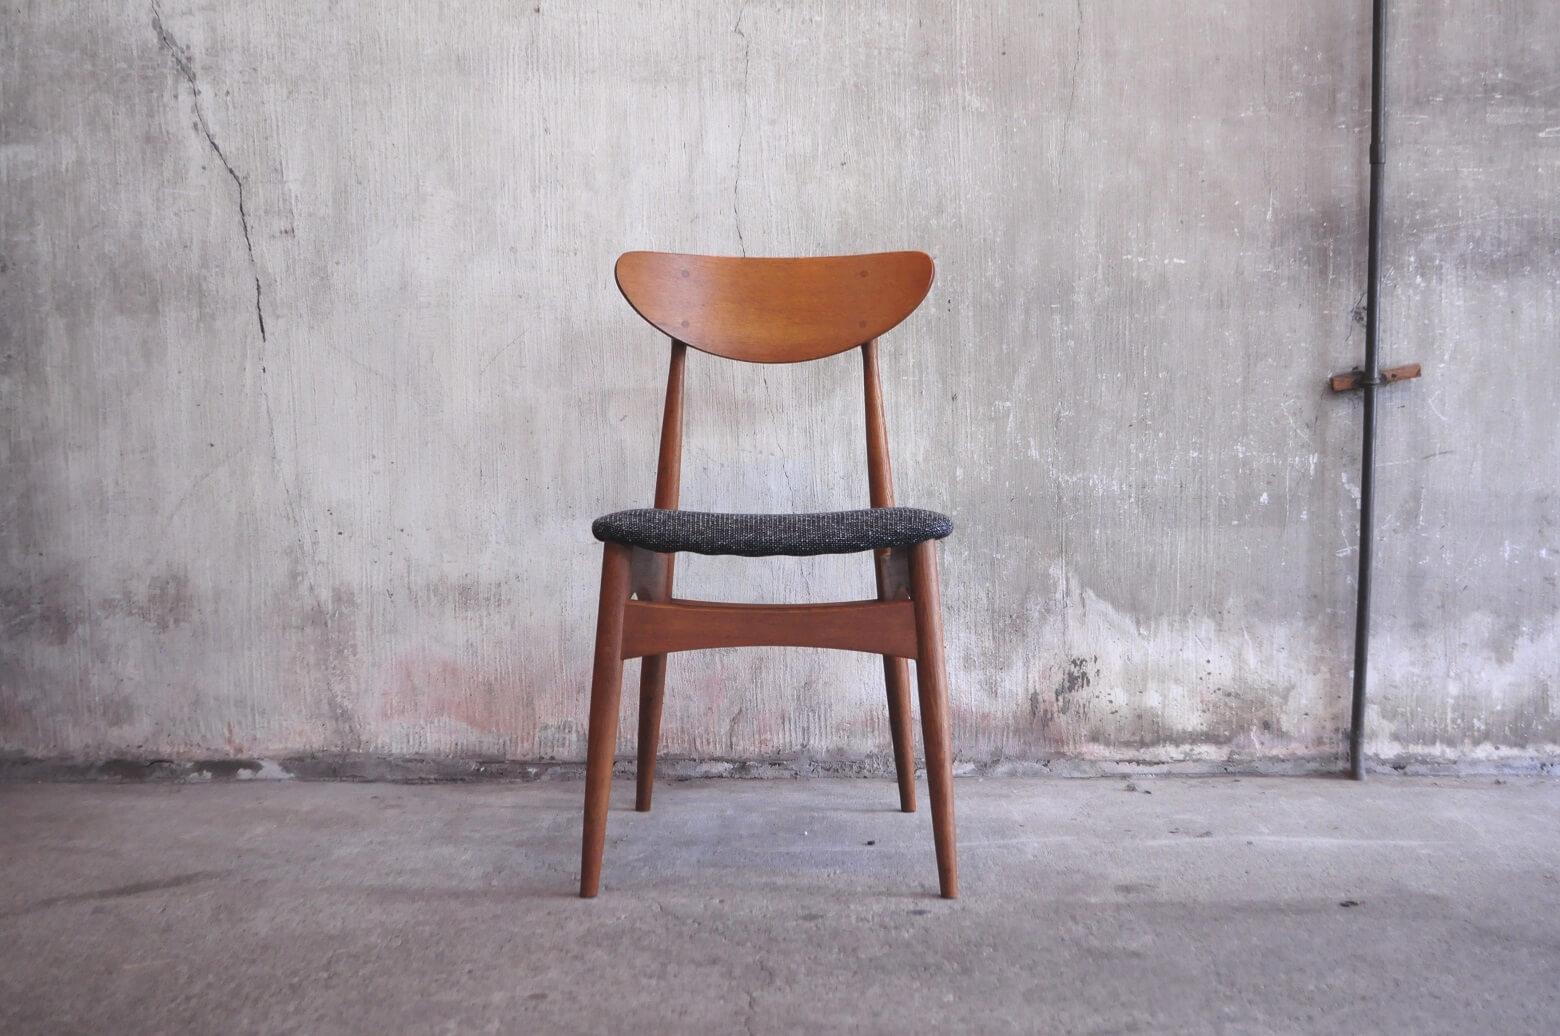 NAGANO INTERIOR Friendly Series Dining Chair DC326-1N REUPHOLSTERED / ナガノ インテリア ダイニング チェア 張り替え済み